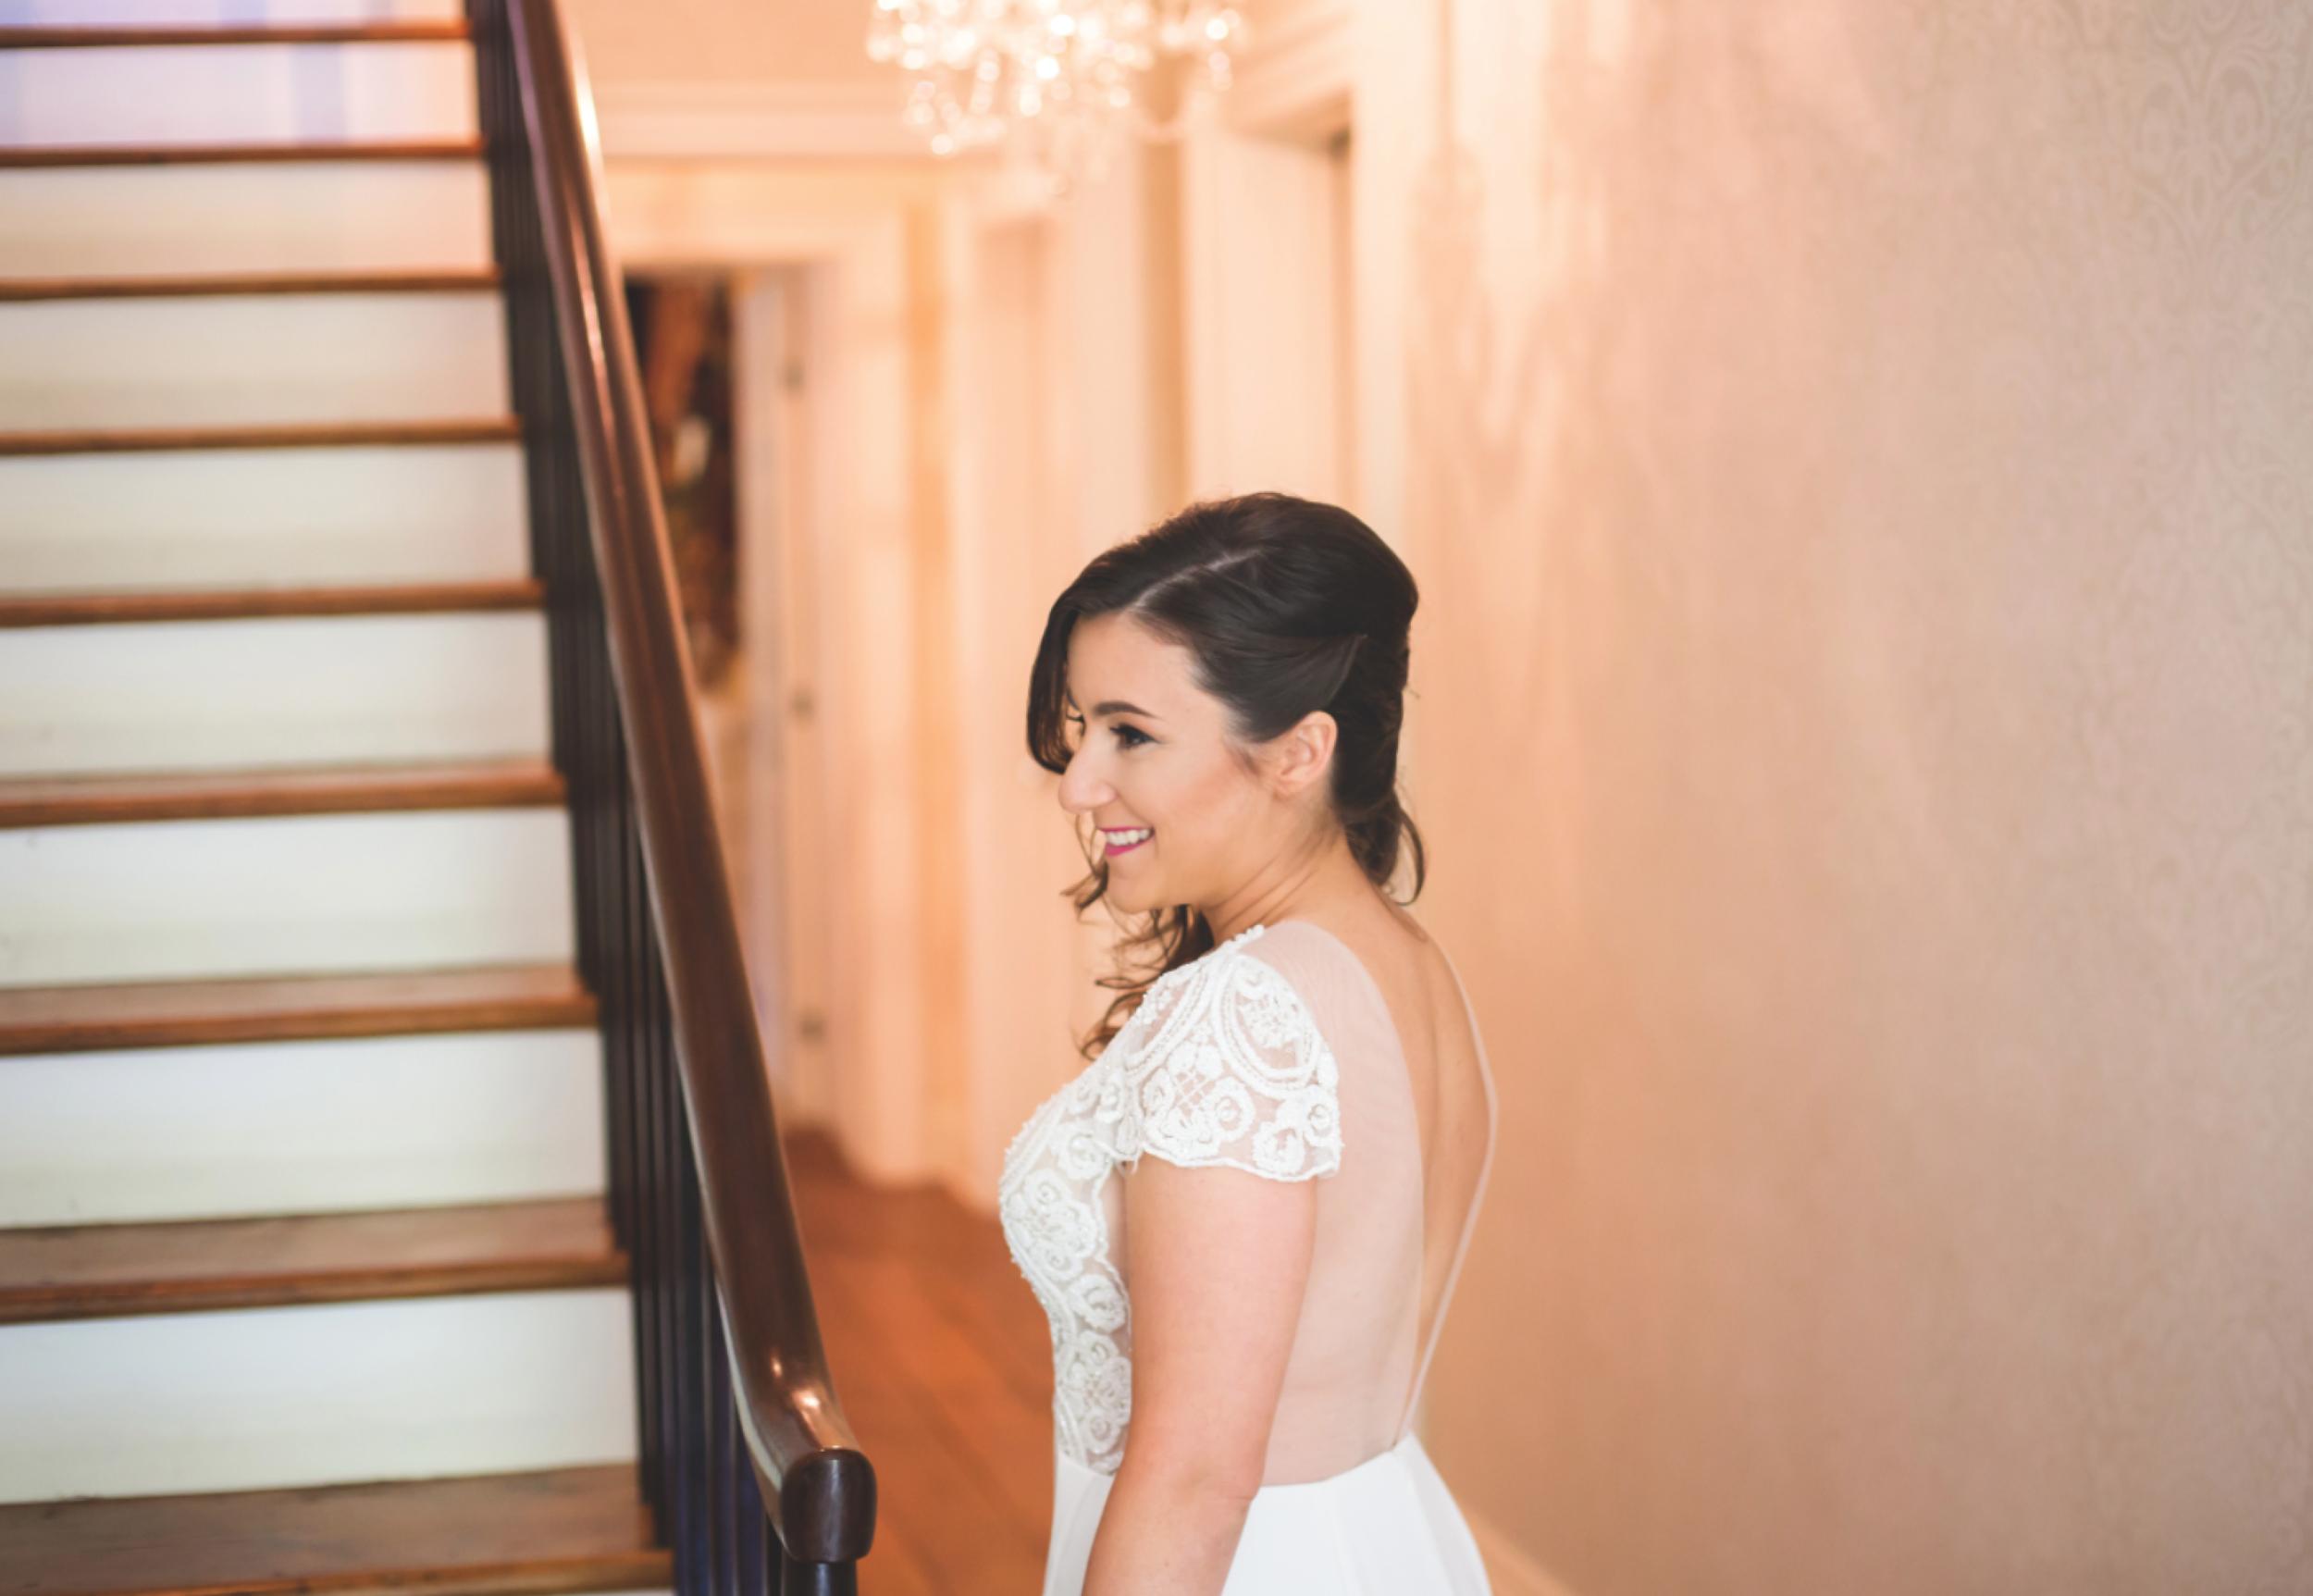 Wedding-Kurtz-Orchard-Market-Niagara-On-The-Lake-Toronto-Hamilton-Burlington-Oakville-Niagara-Wedding-Photographer-Photography-Moments-by-Lauren-Photo-Image-11.png